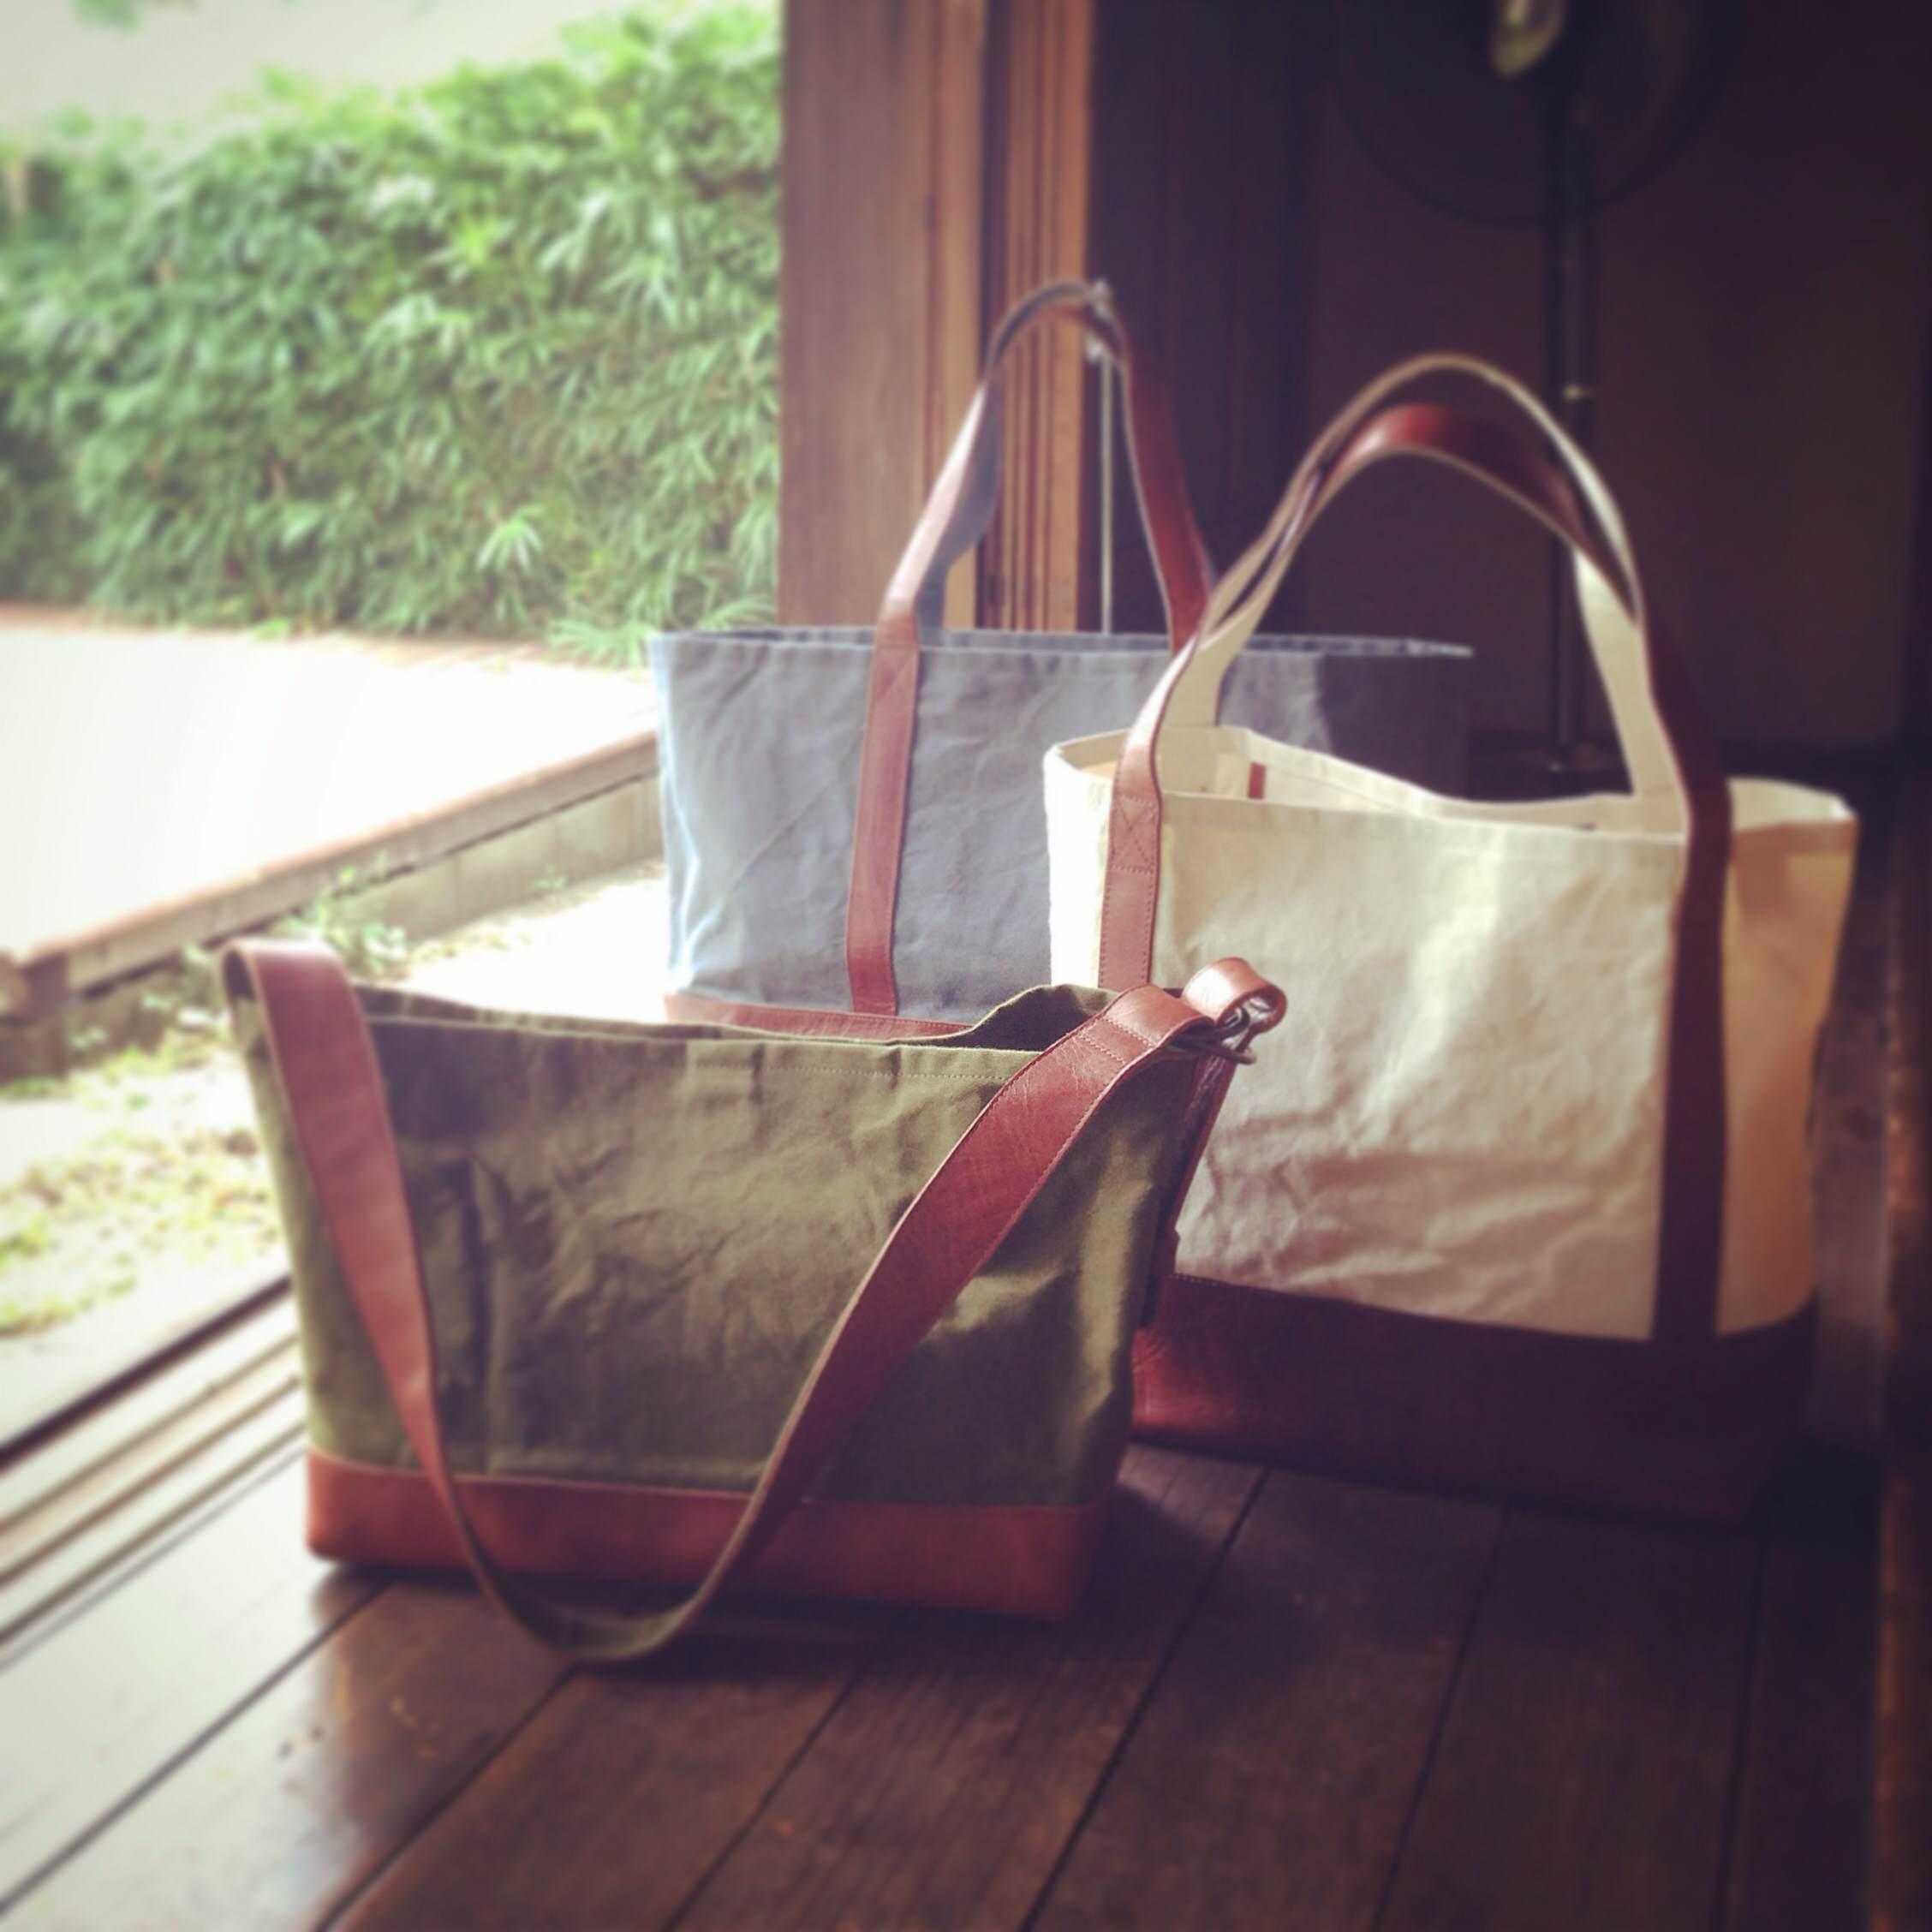 fabrica.の鞄のこと 1_d0210537_14482832.jpg